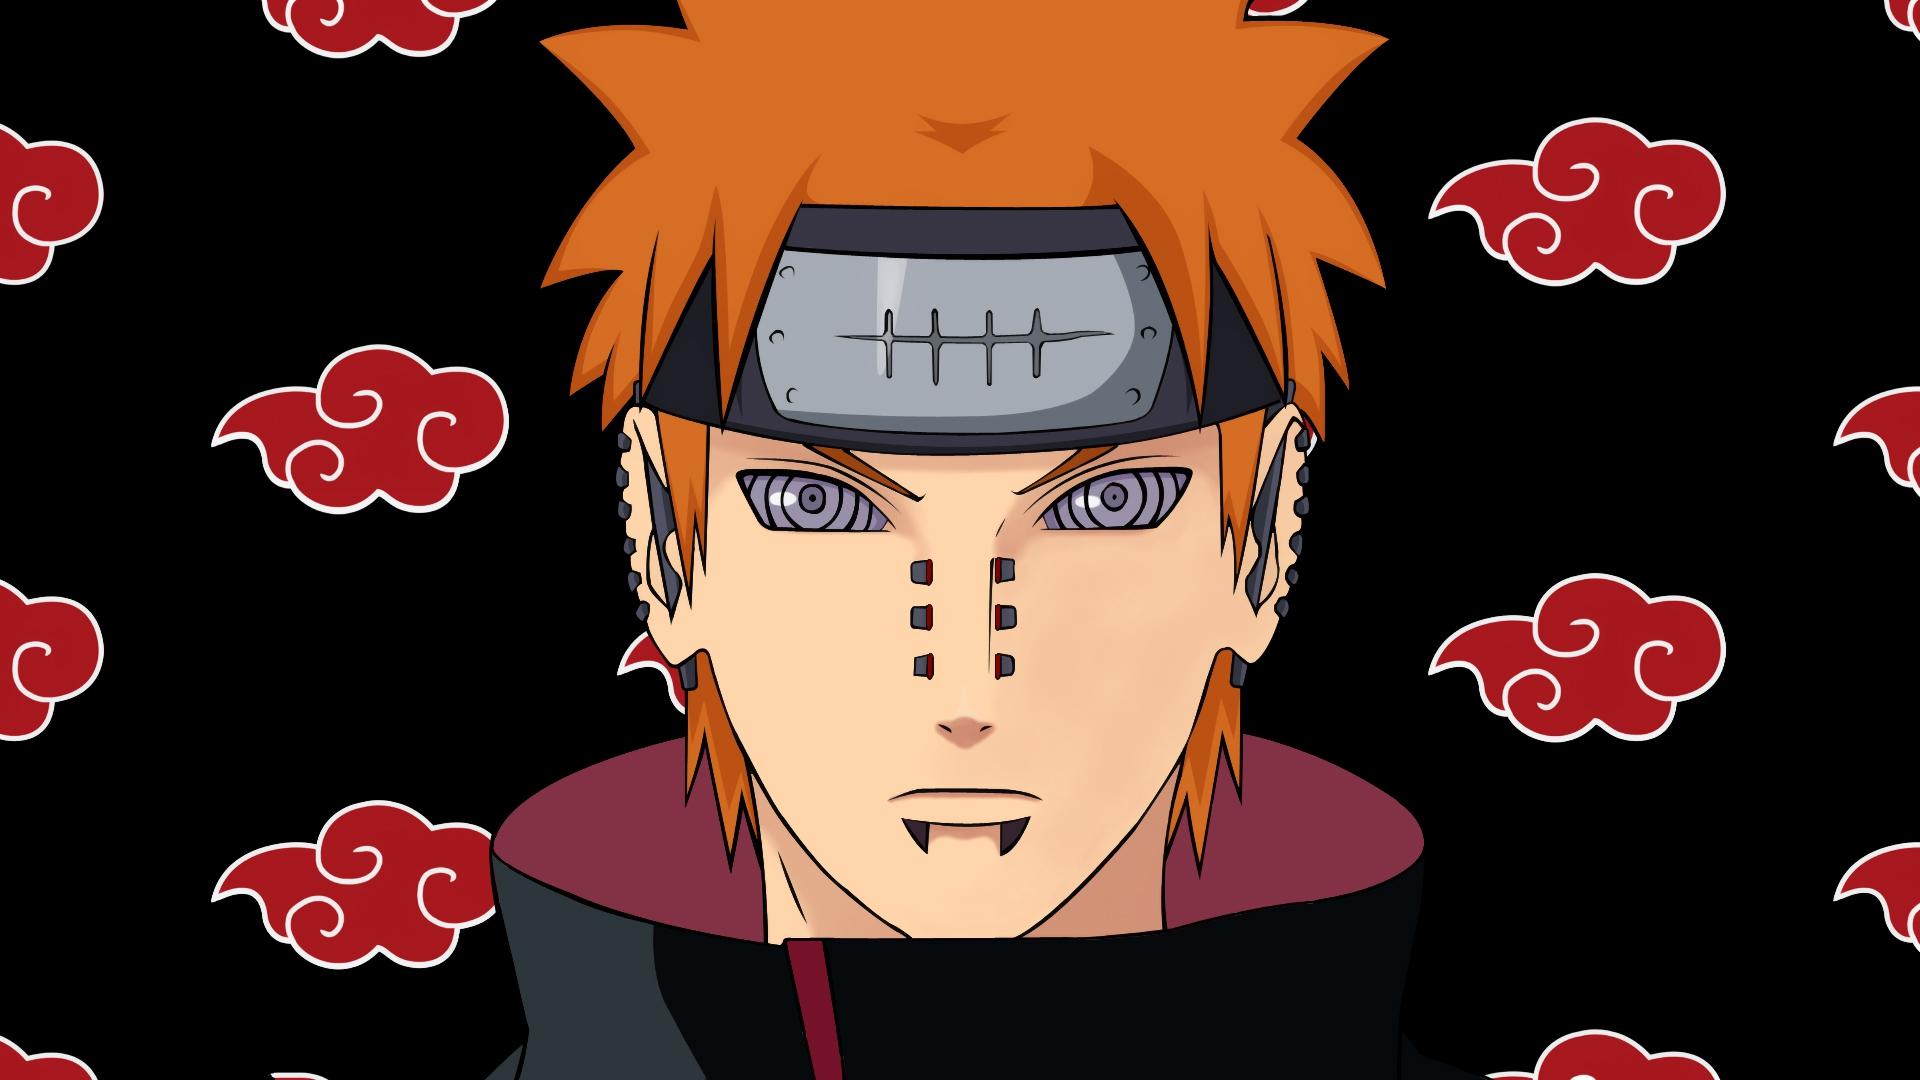 Naruto Shippuden Wallpaper 3d Free Download Akatsuki Cloud Hd Wallpaper Pixelstalk Net